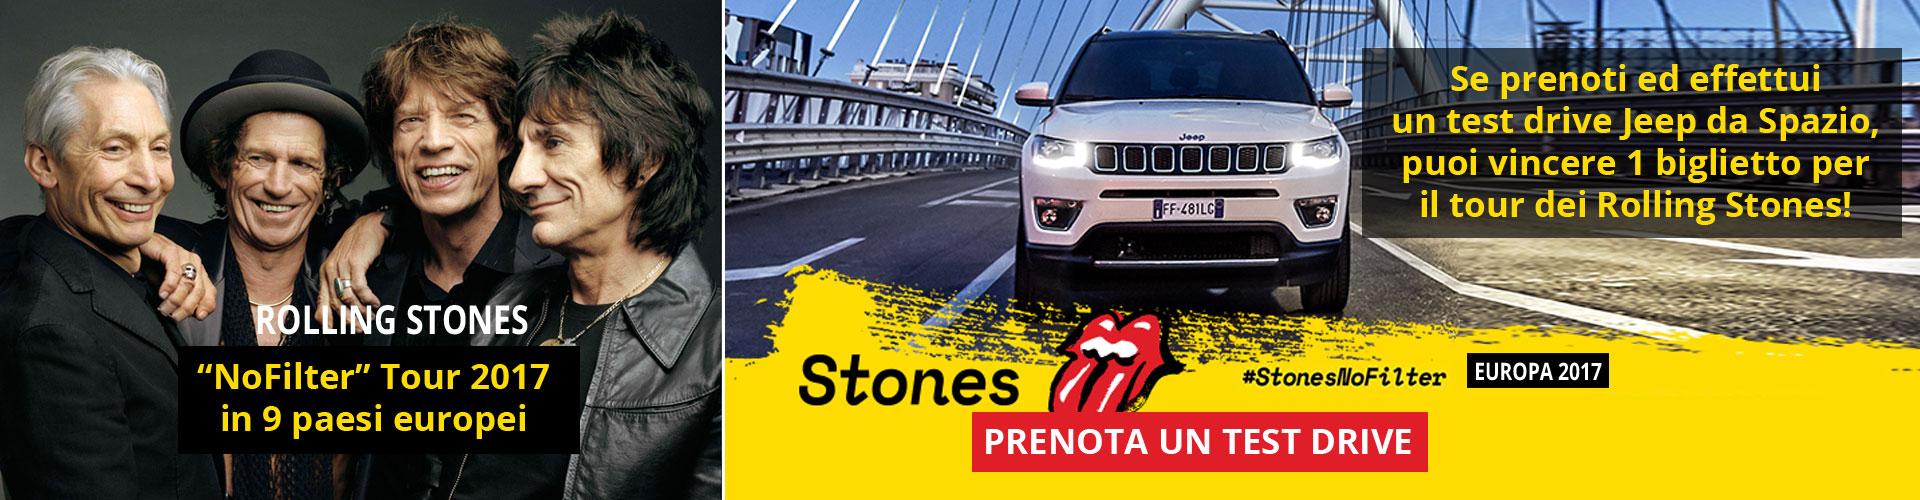 Jeep sponsor Rolling Stones Tour 2017